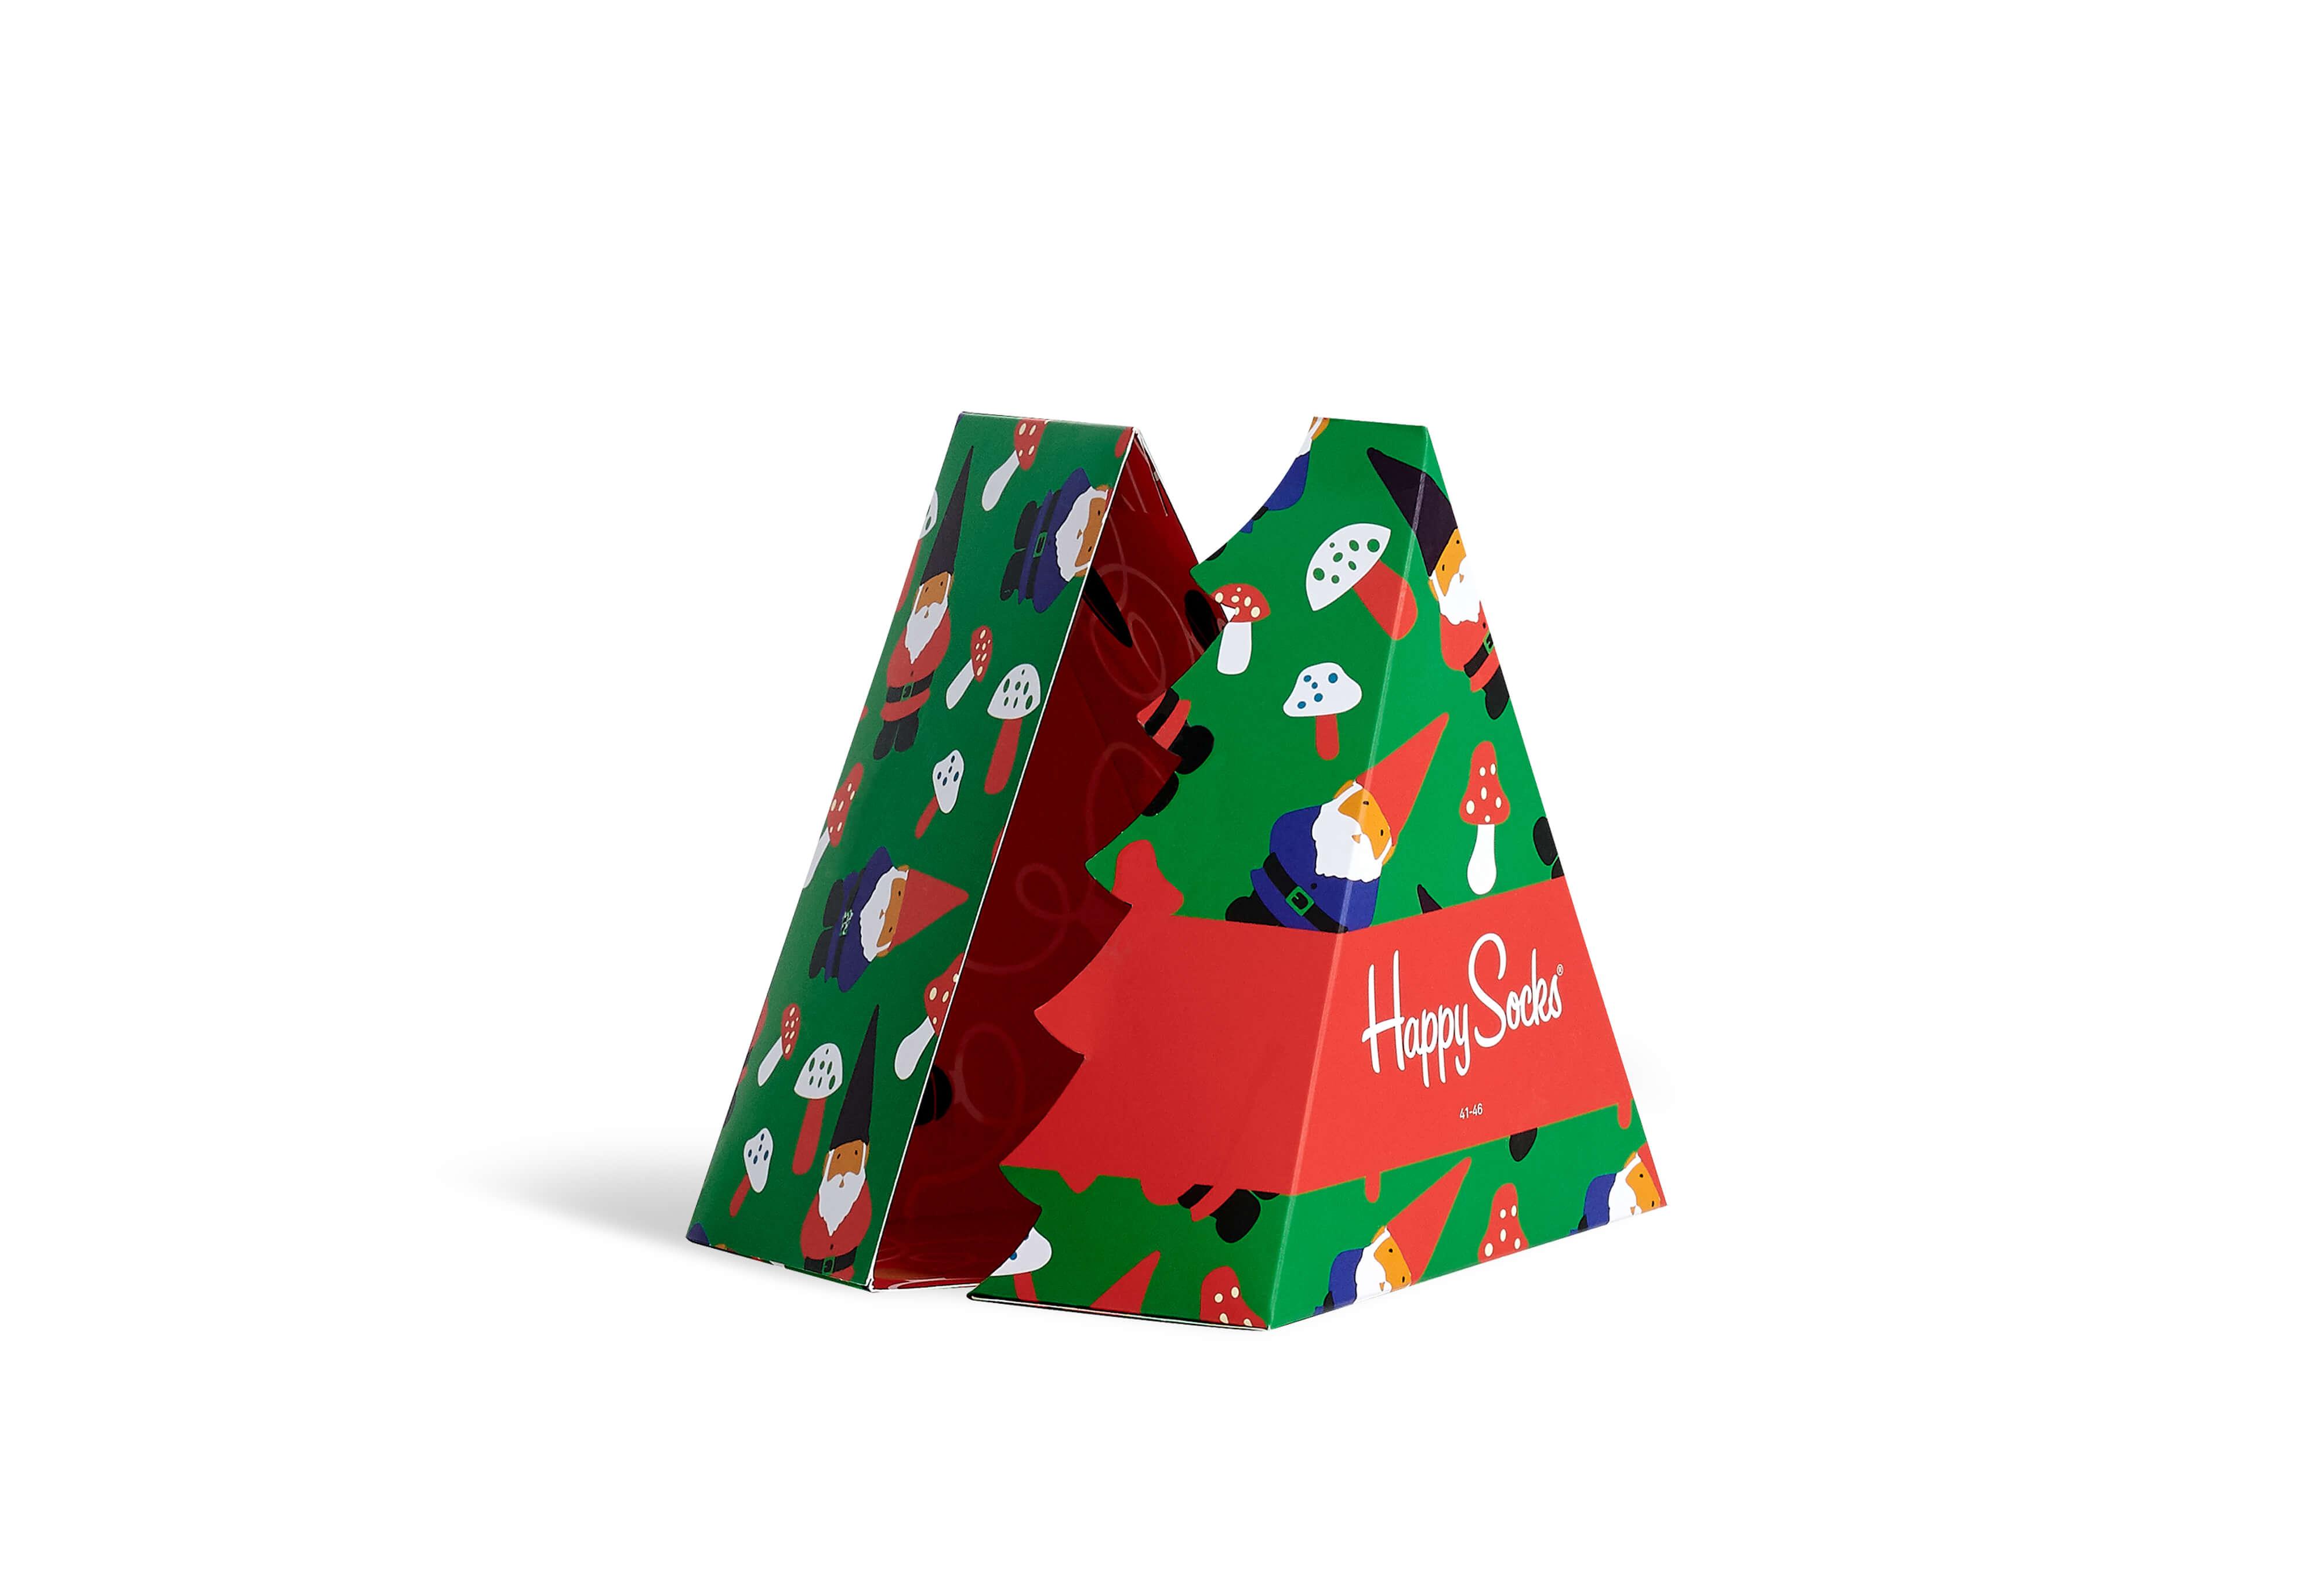 happy socks caja verde y roja de packaging navideño